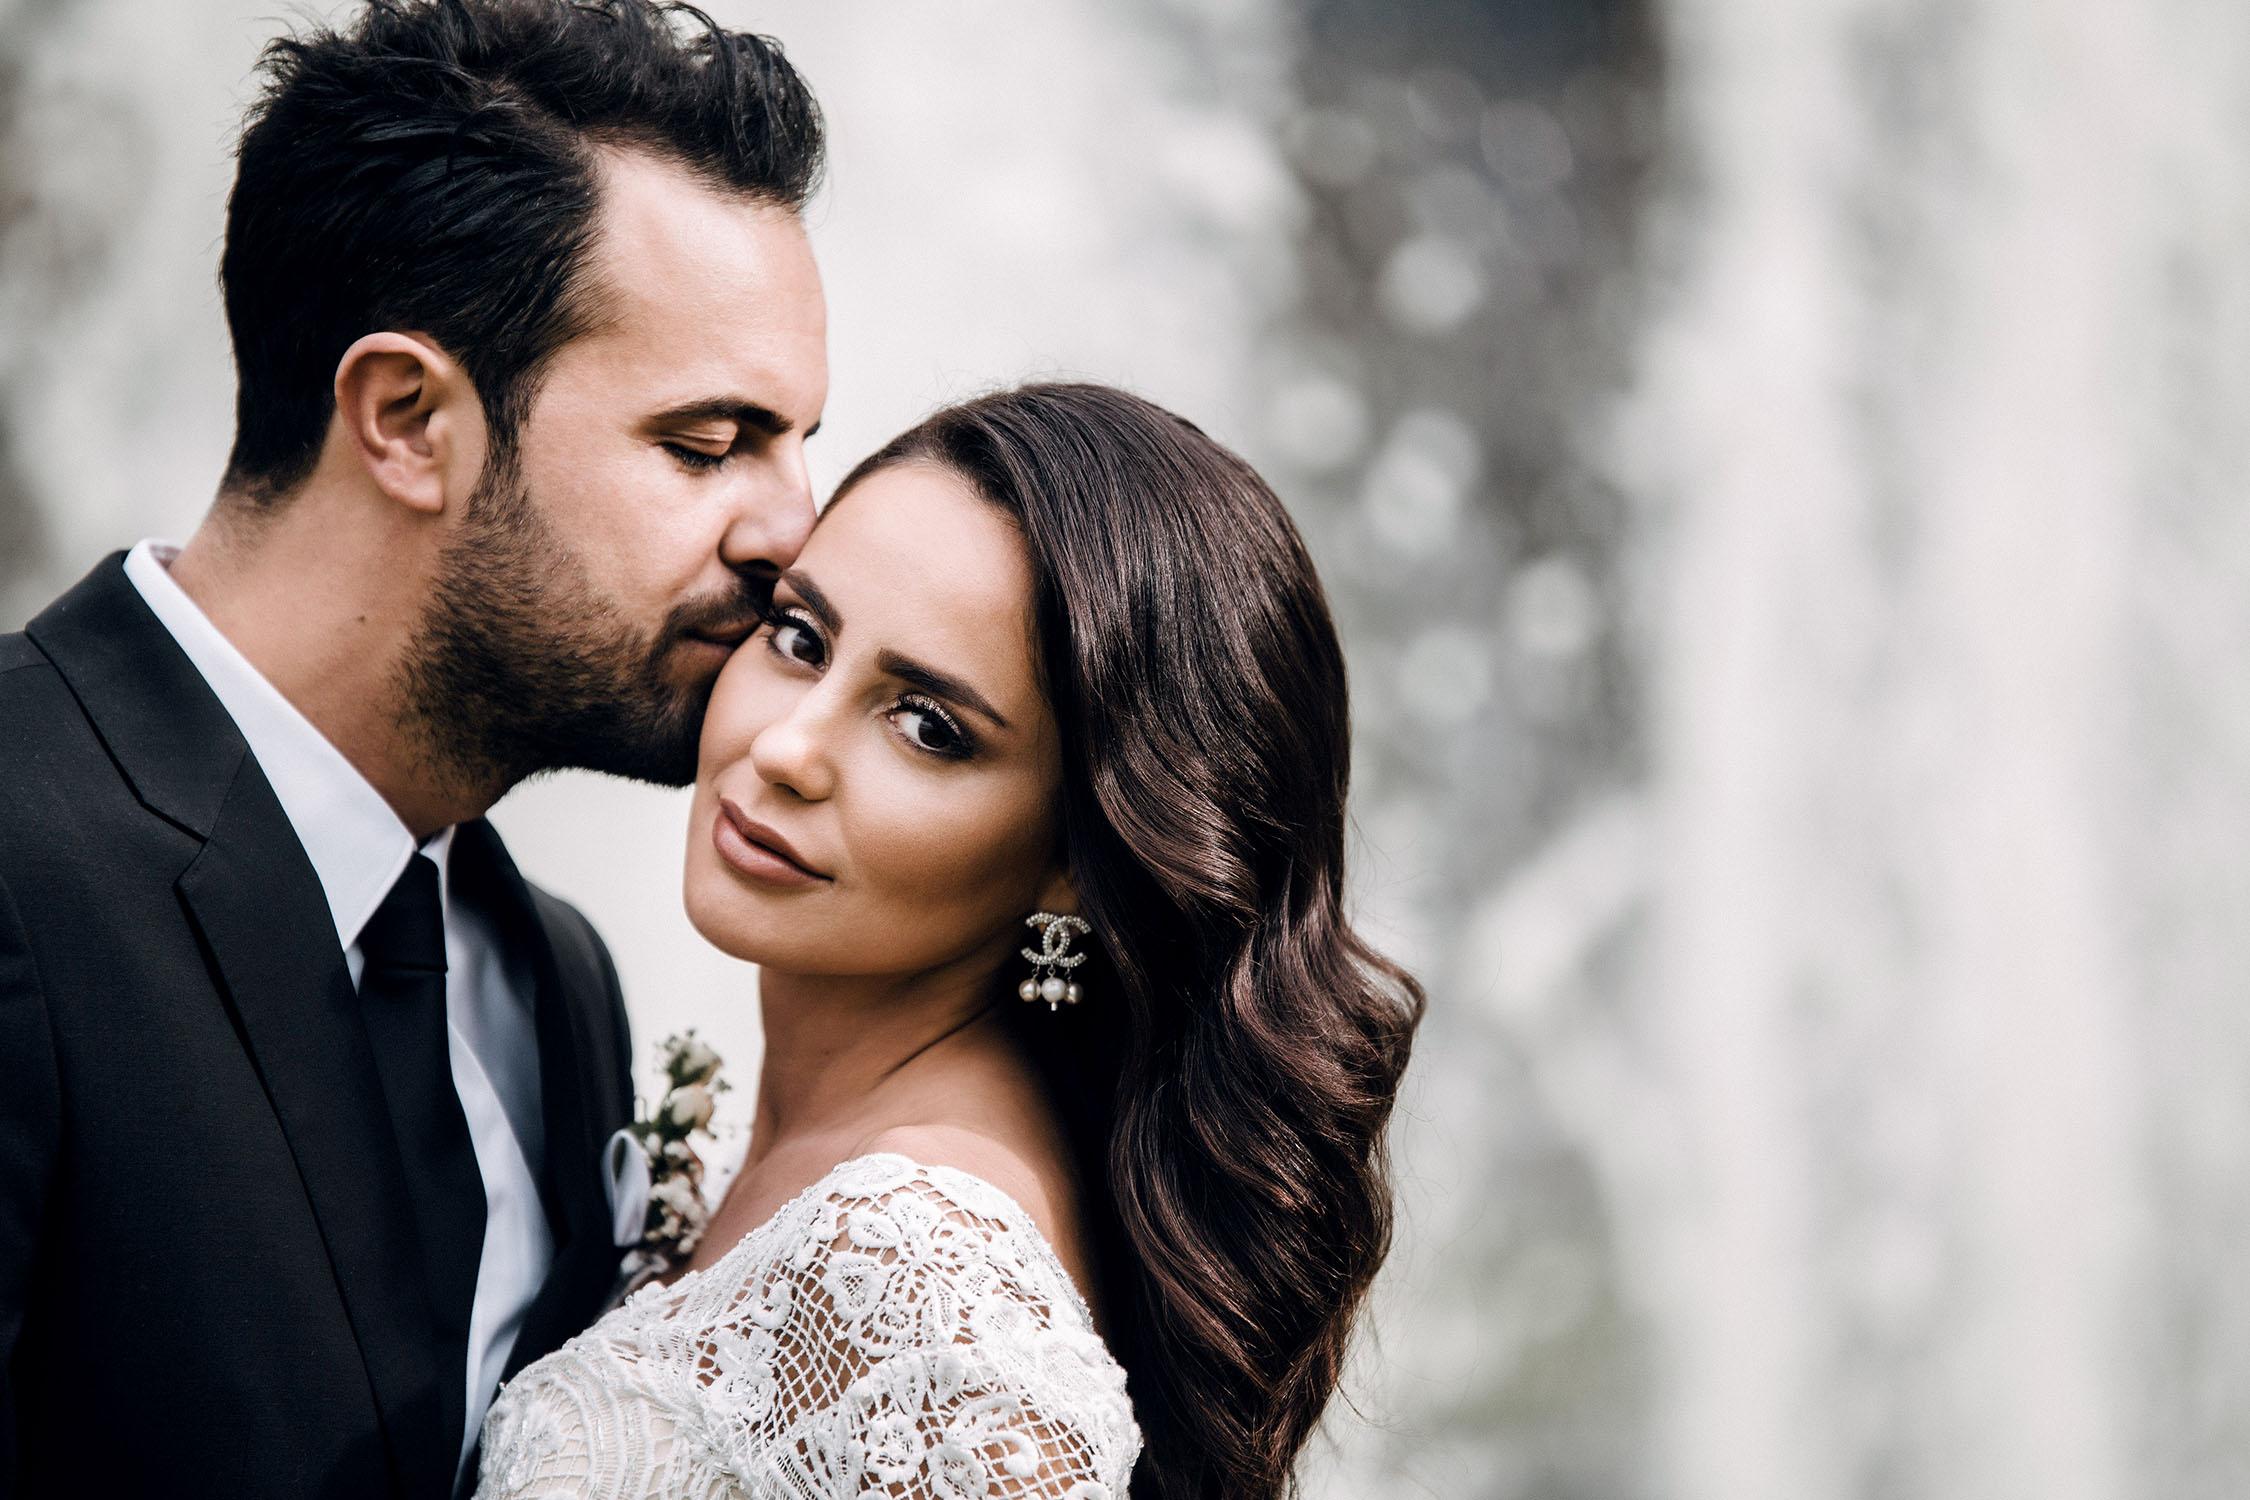 Bräutigam küsst seine Braut.jpg